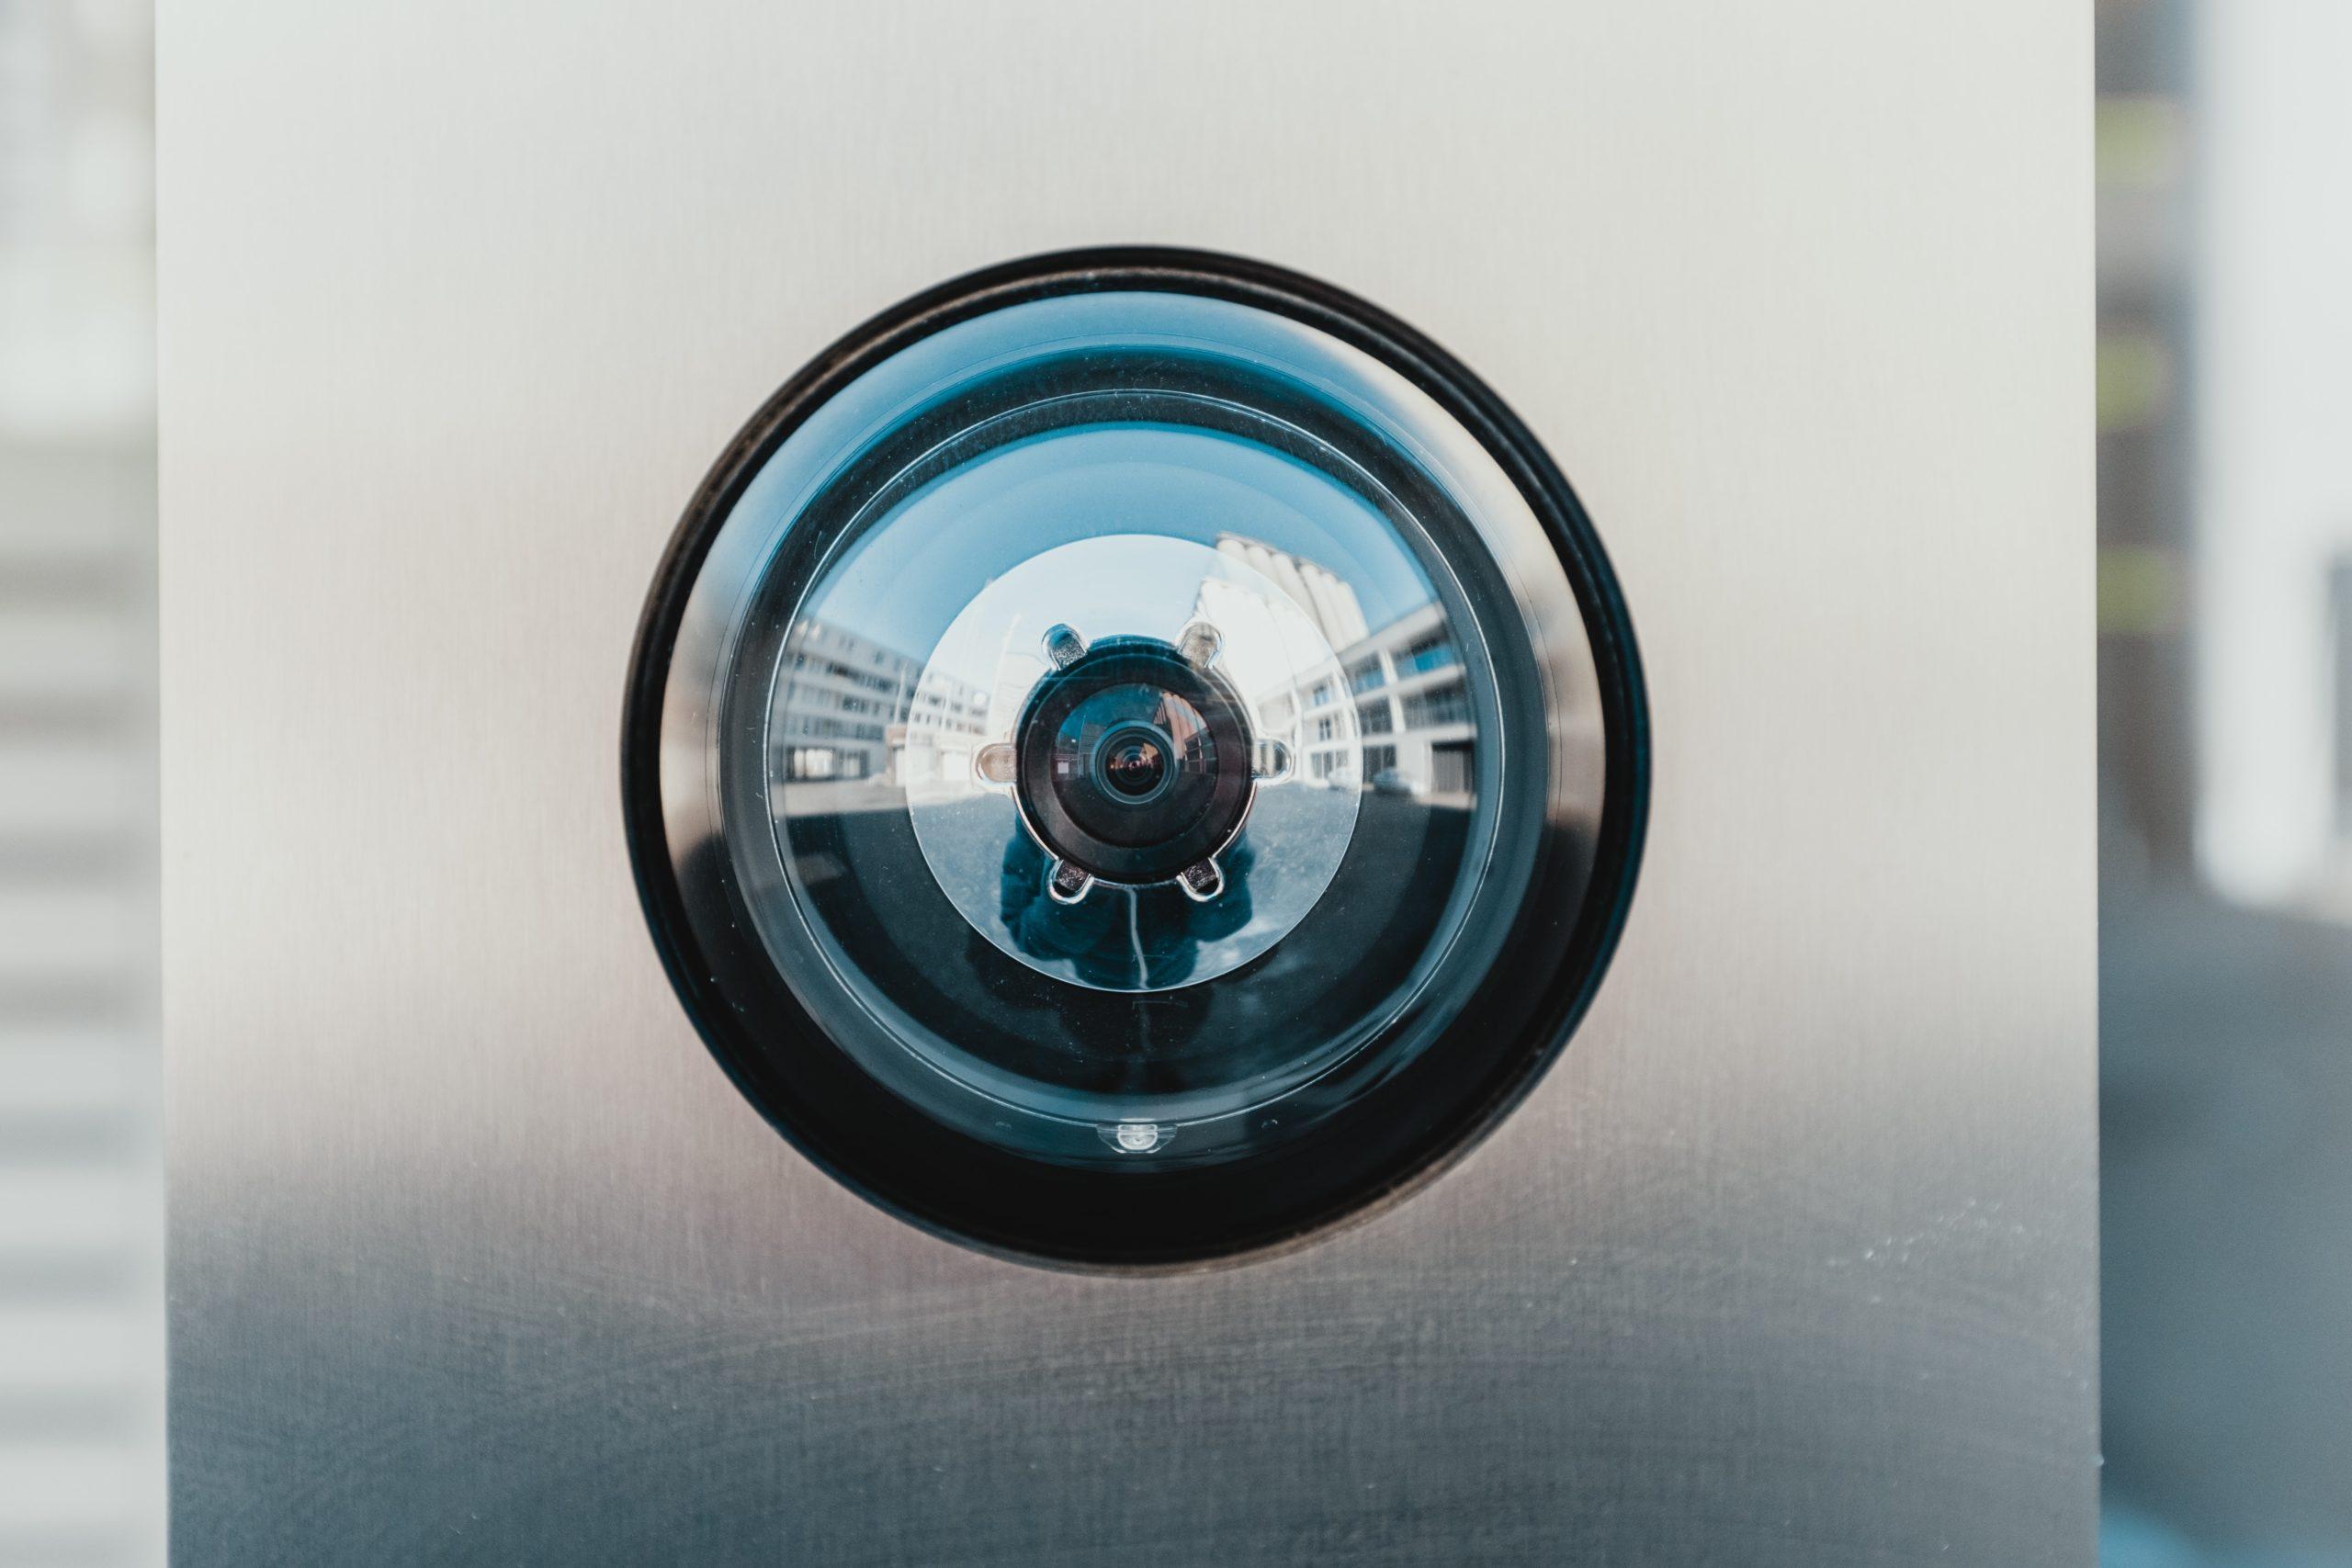 A close-up of a surveillance camera lens. Photo by Bernard Hermant on Unsplash